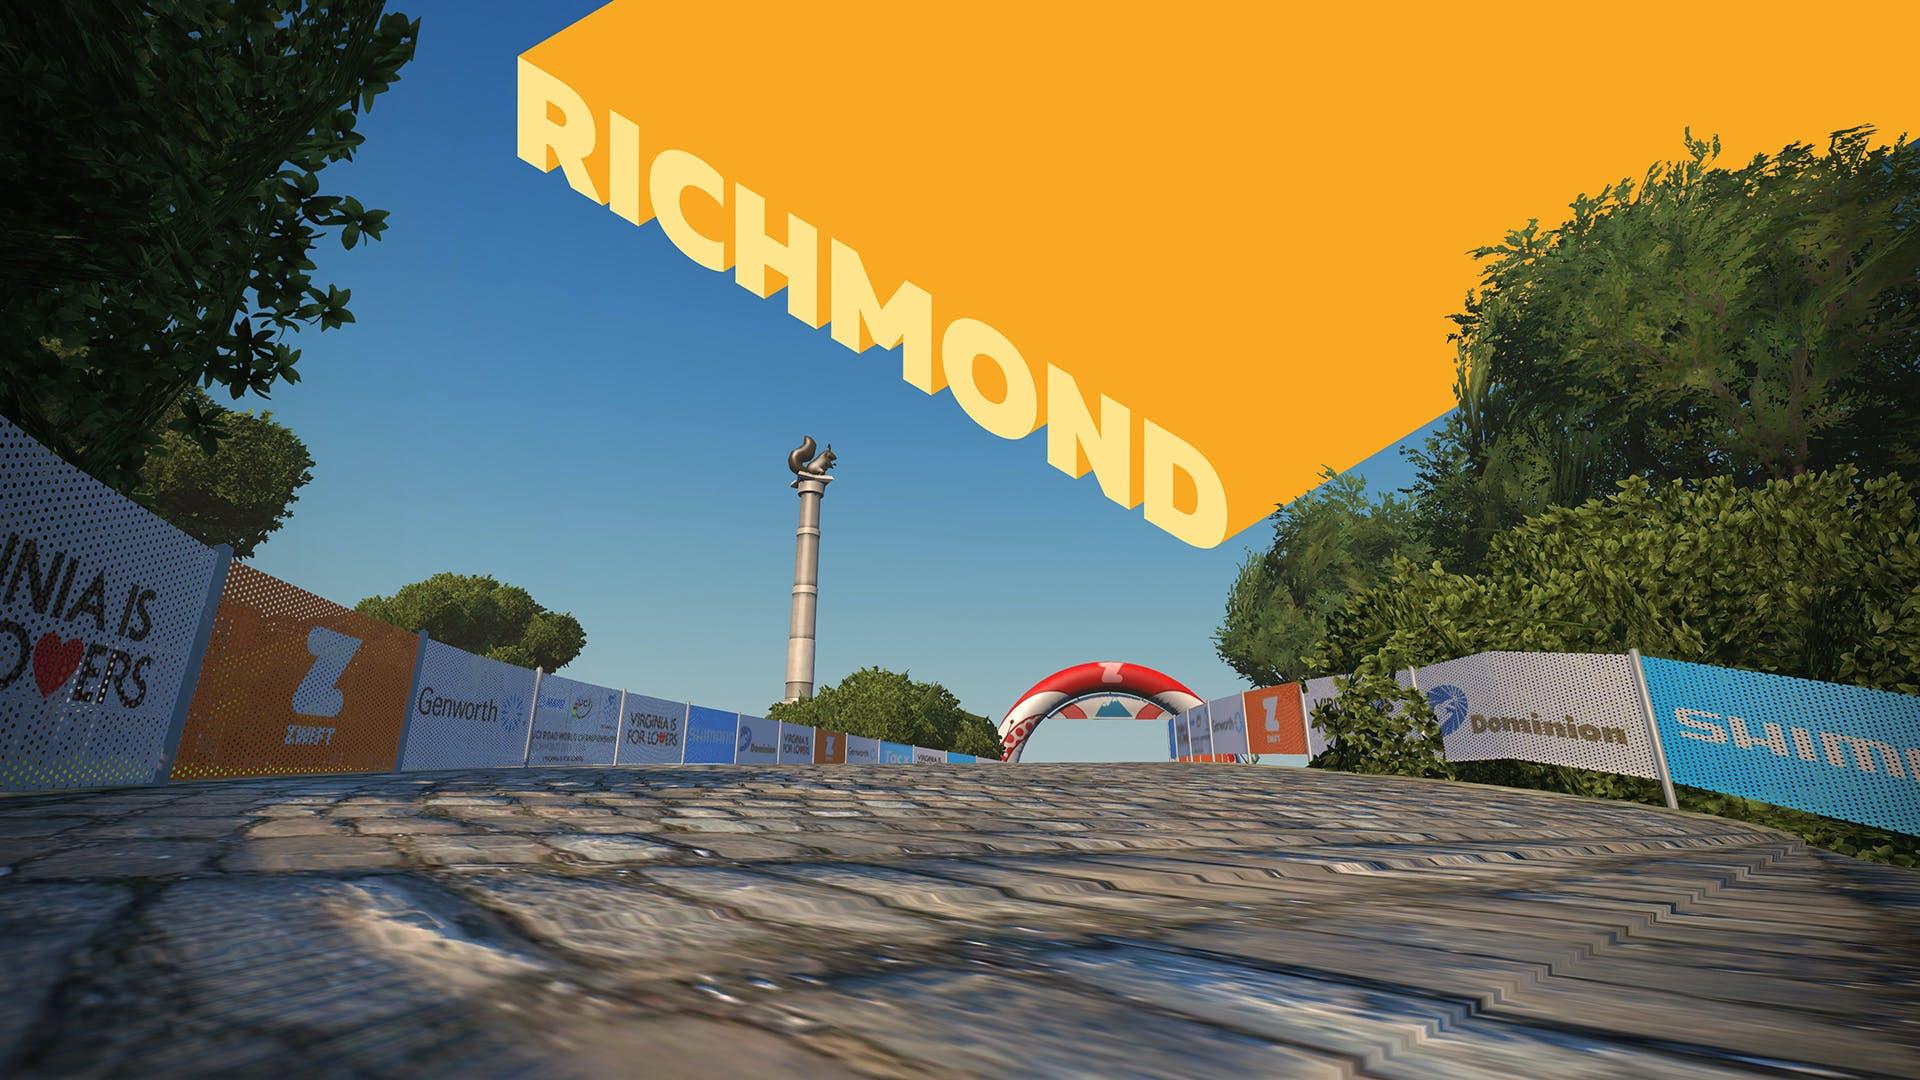 6. Etappe: Richmond